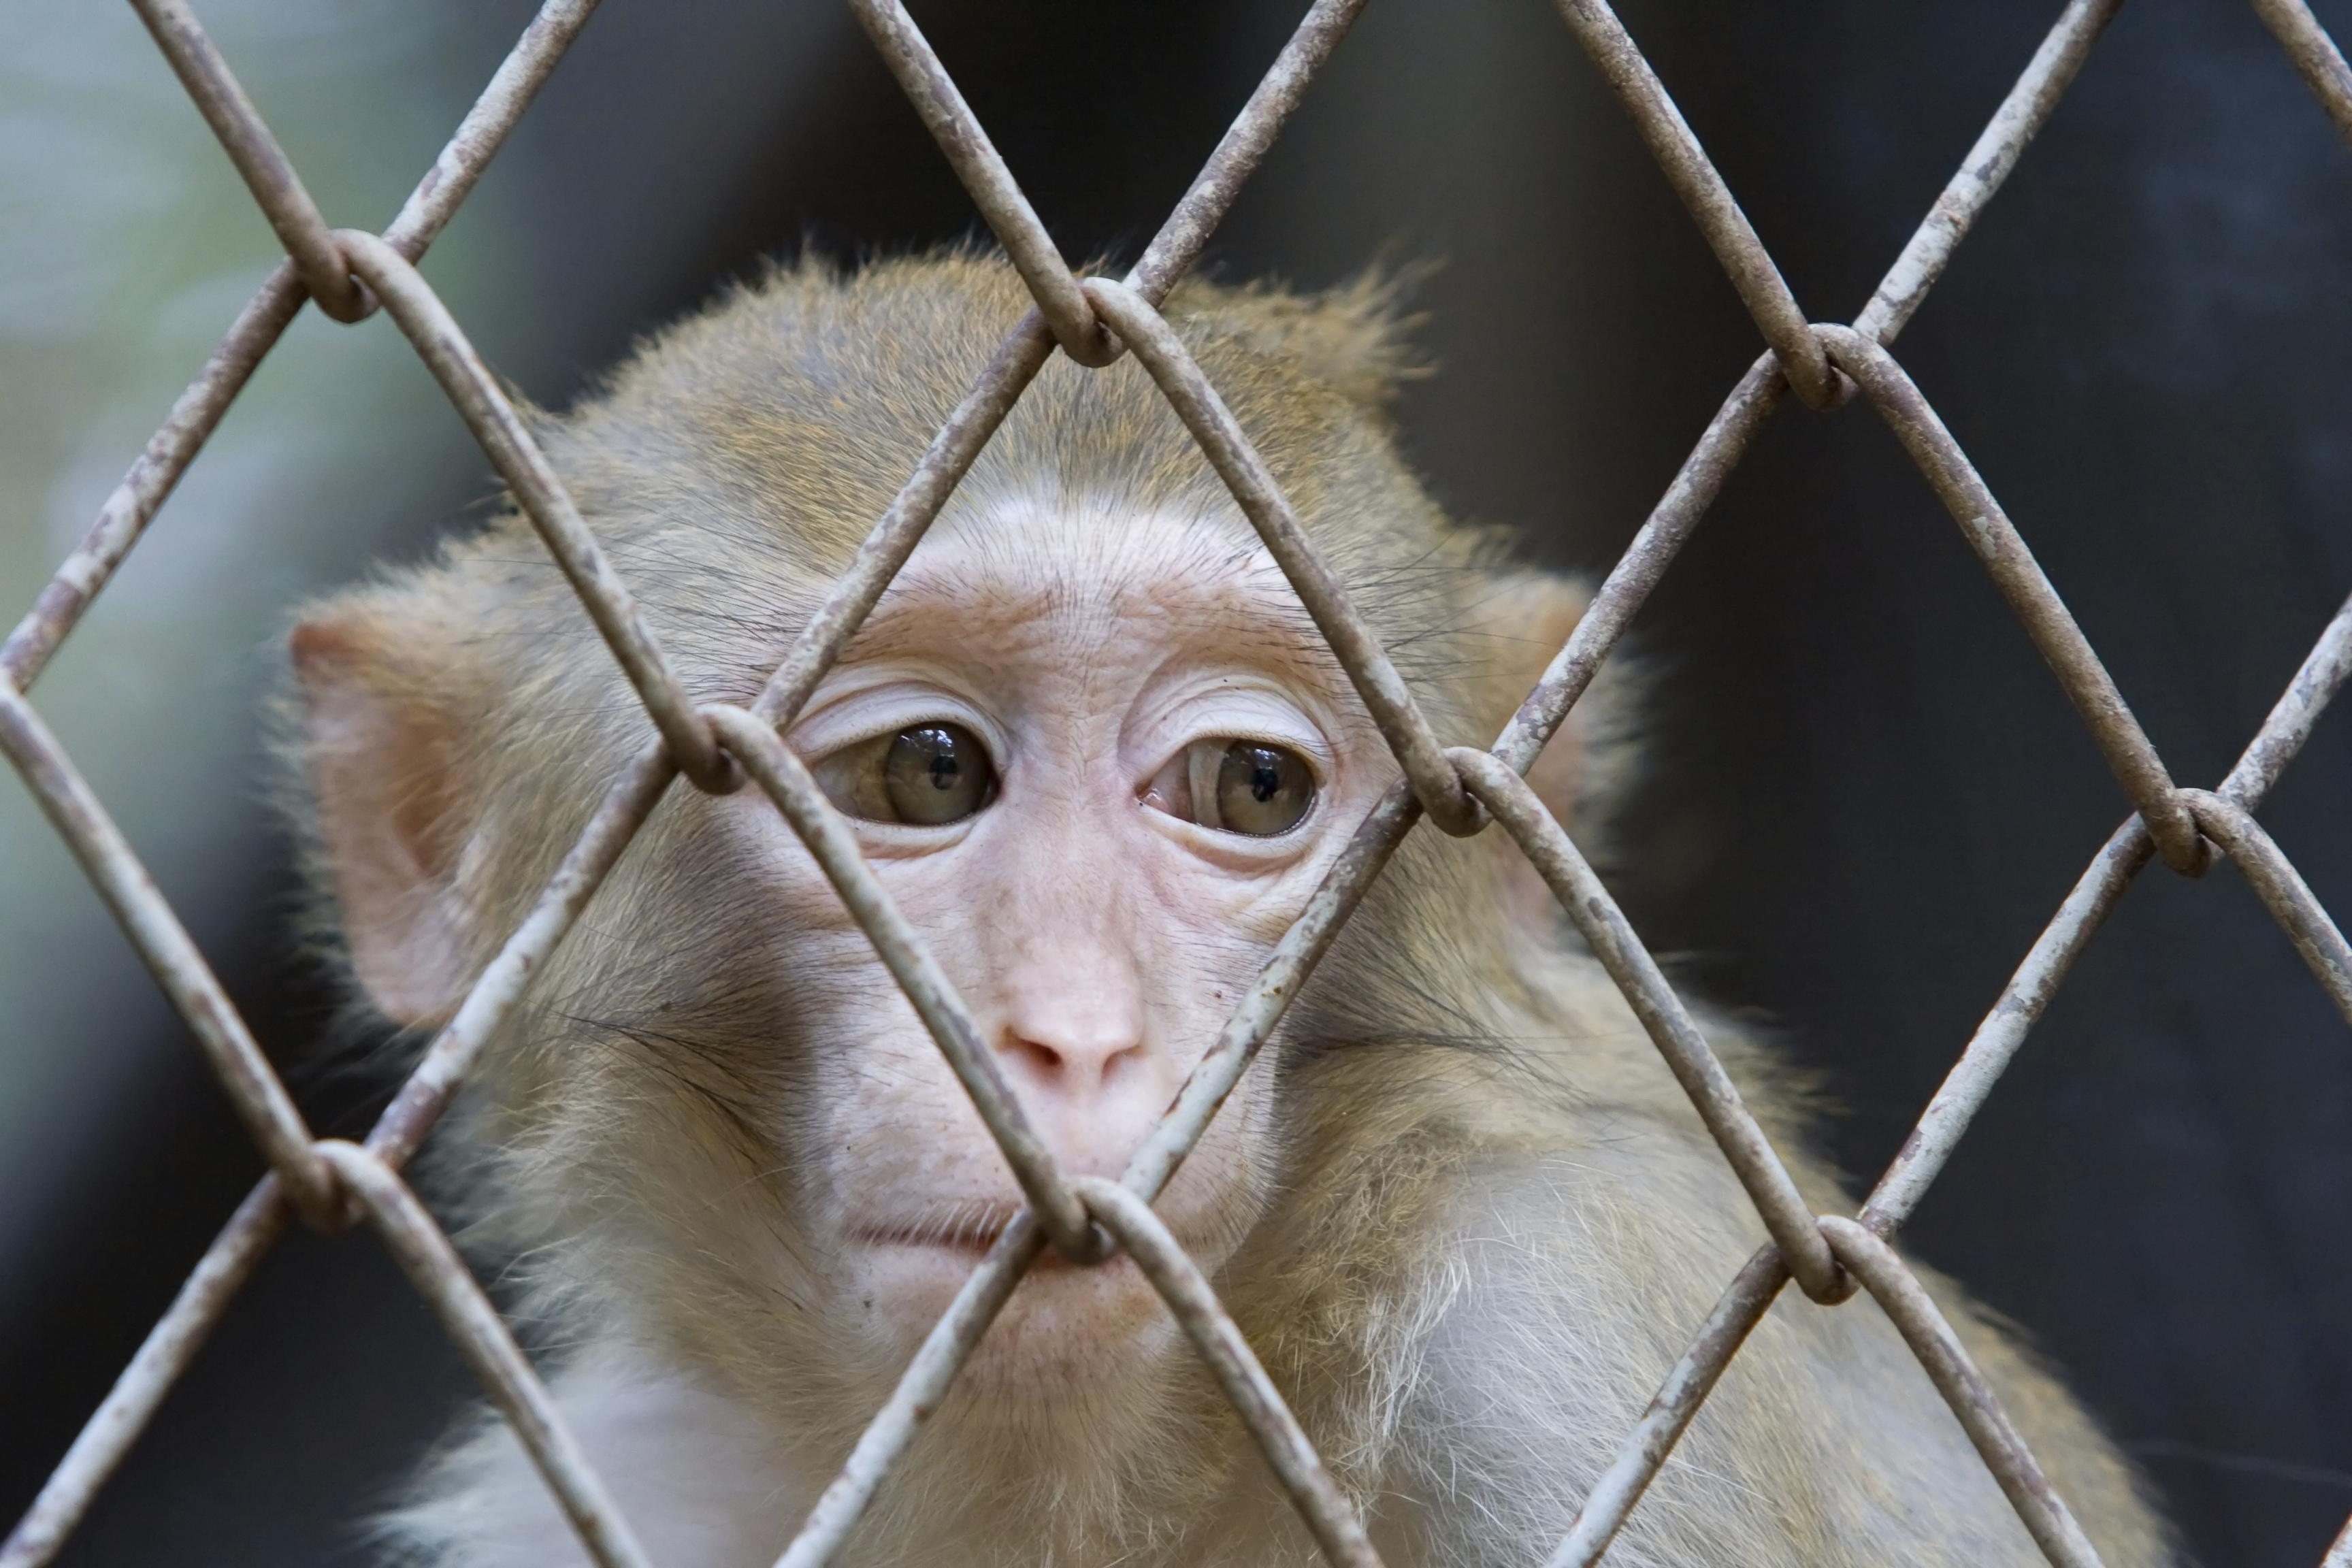 monkey_caged_sad.jpg